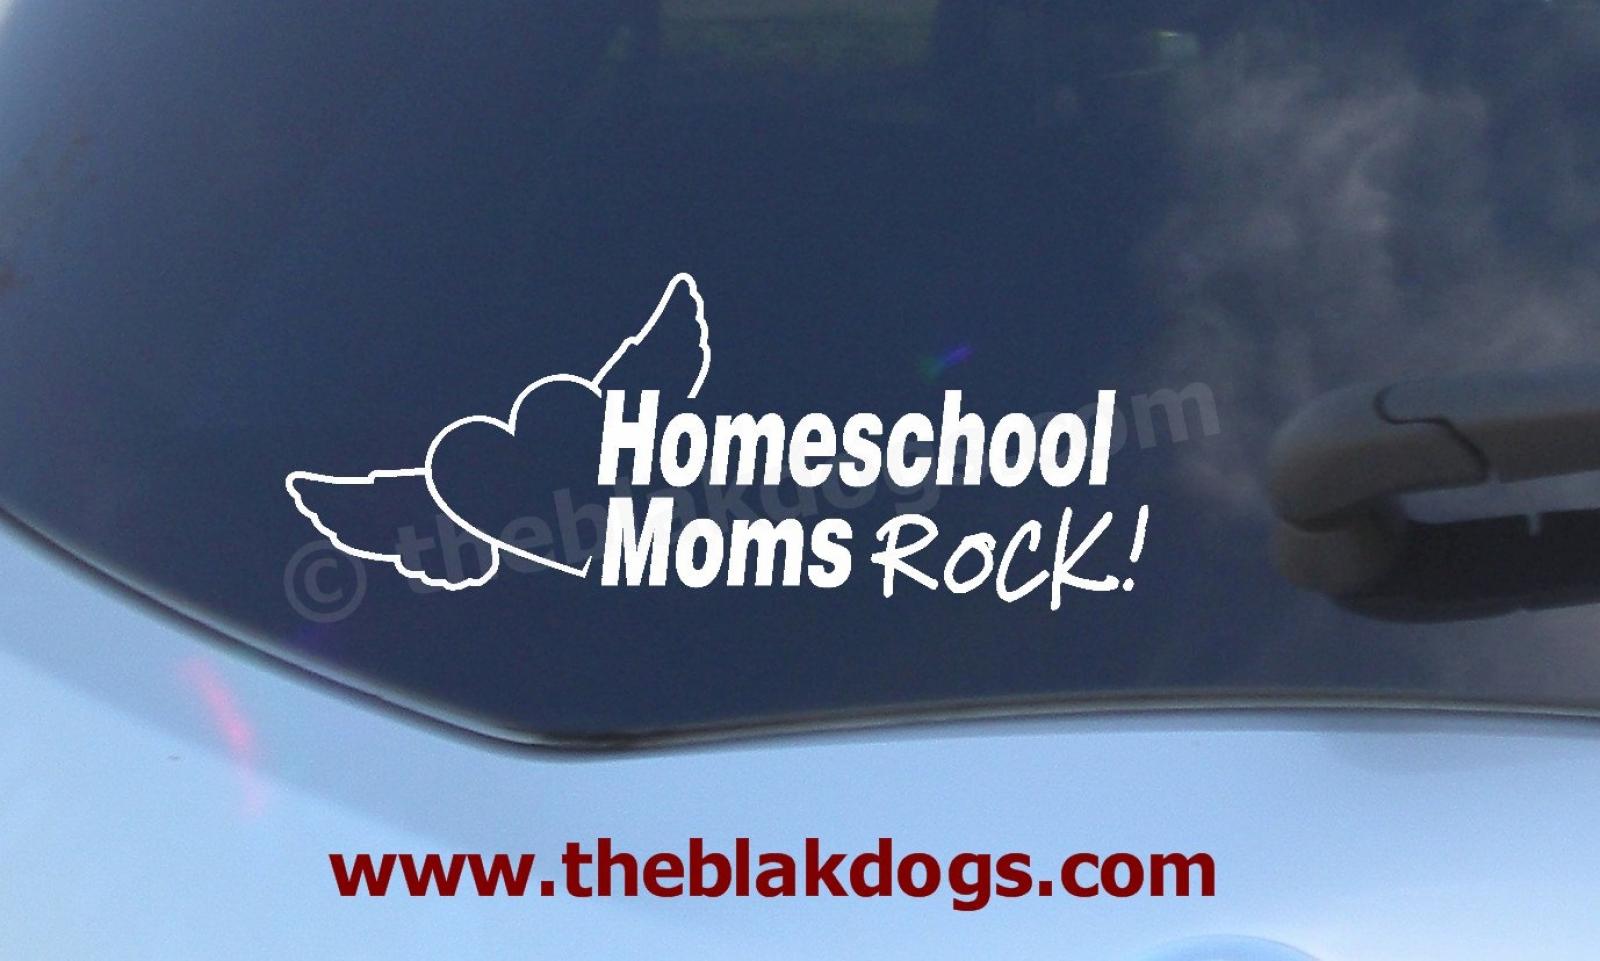 Car decal homeschool sticker zoom